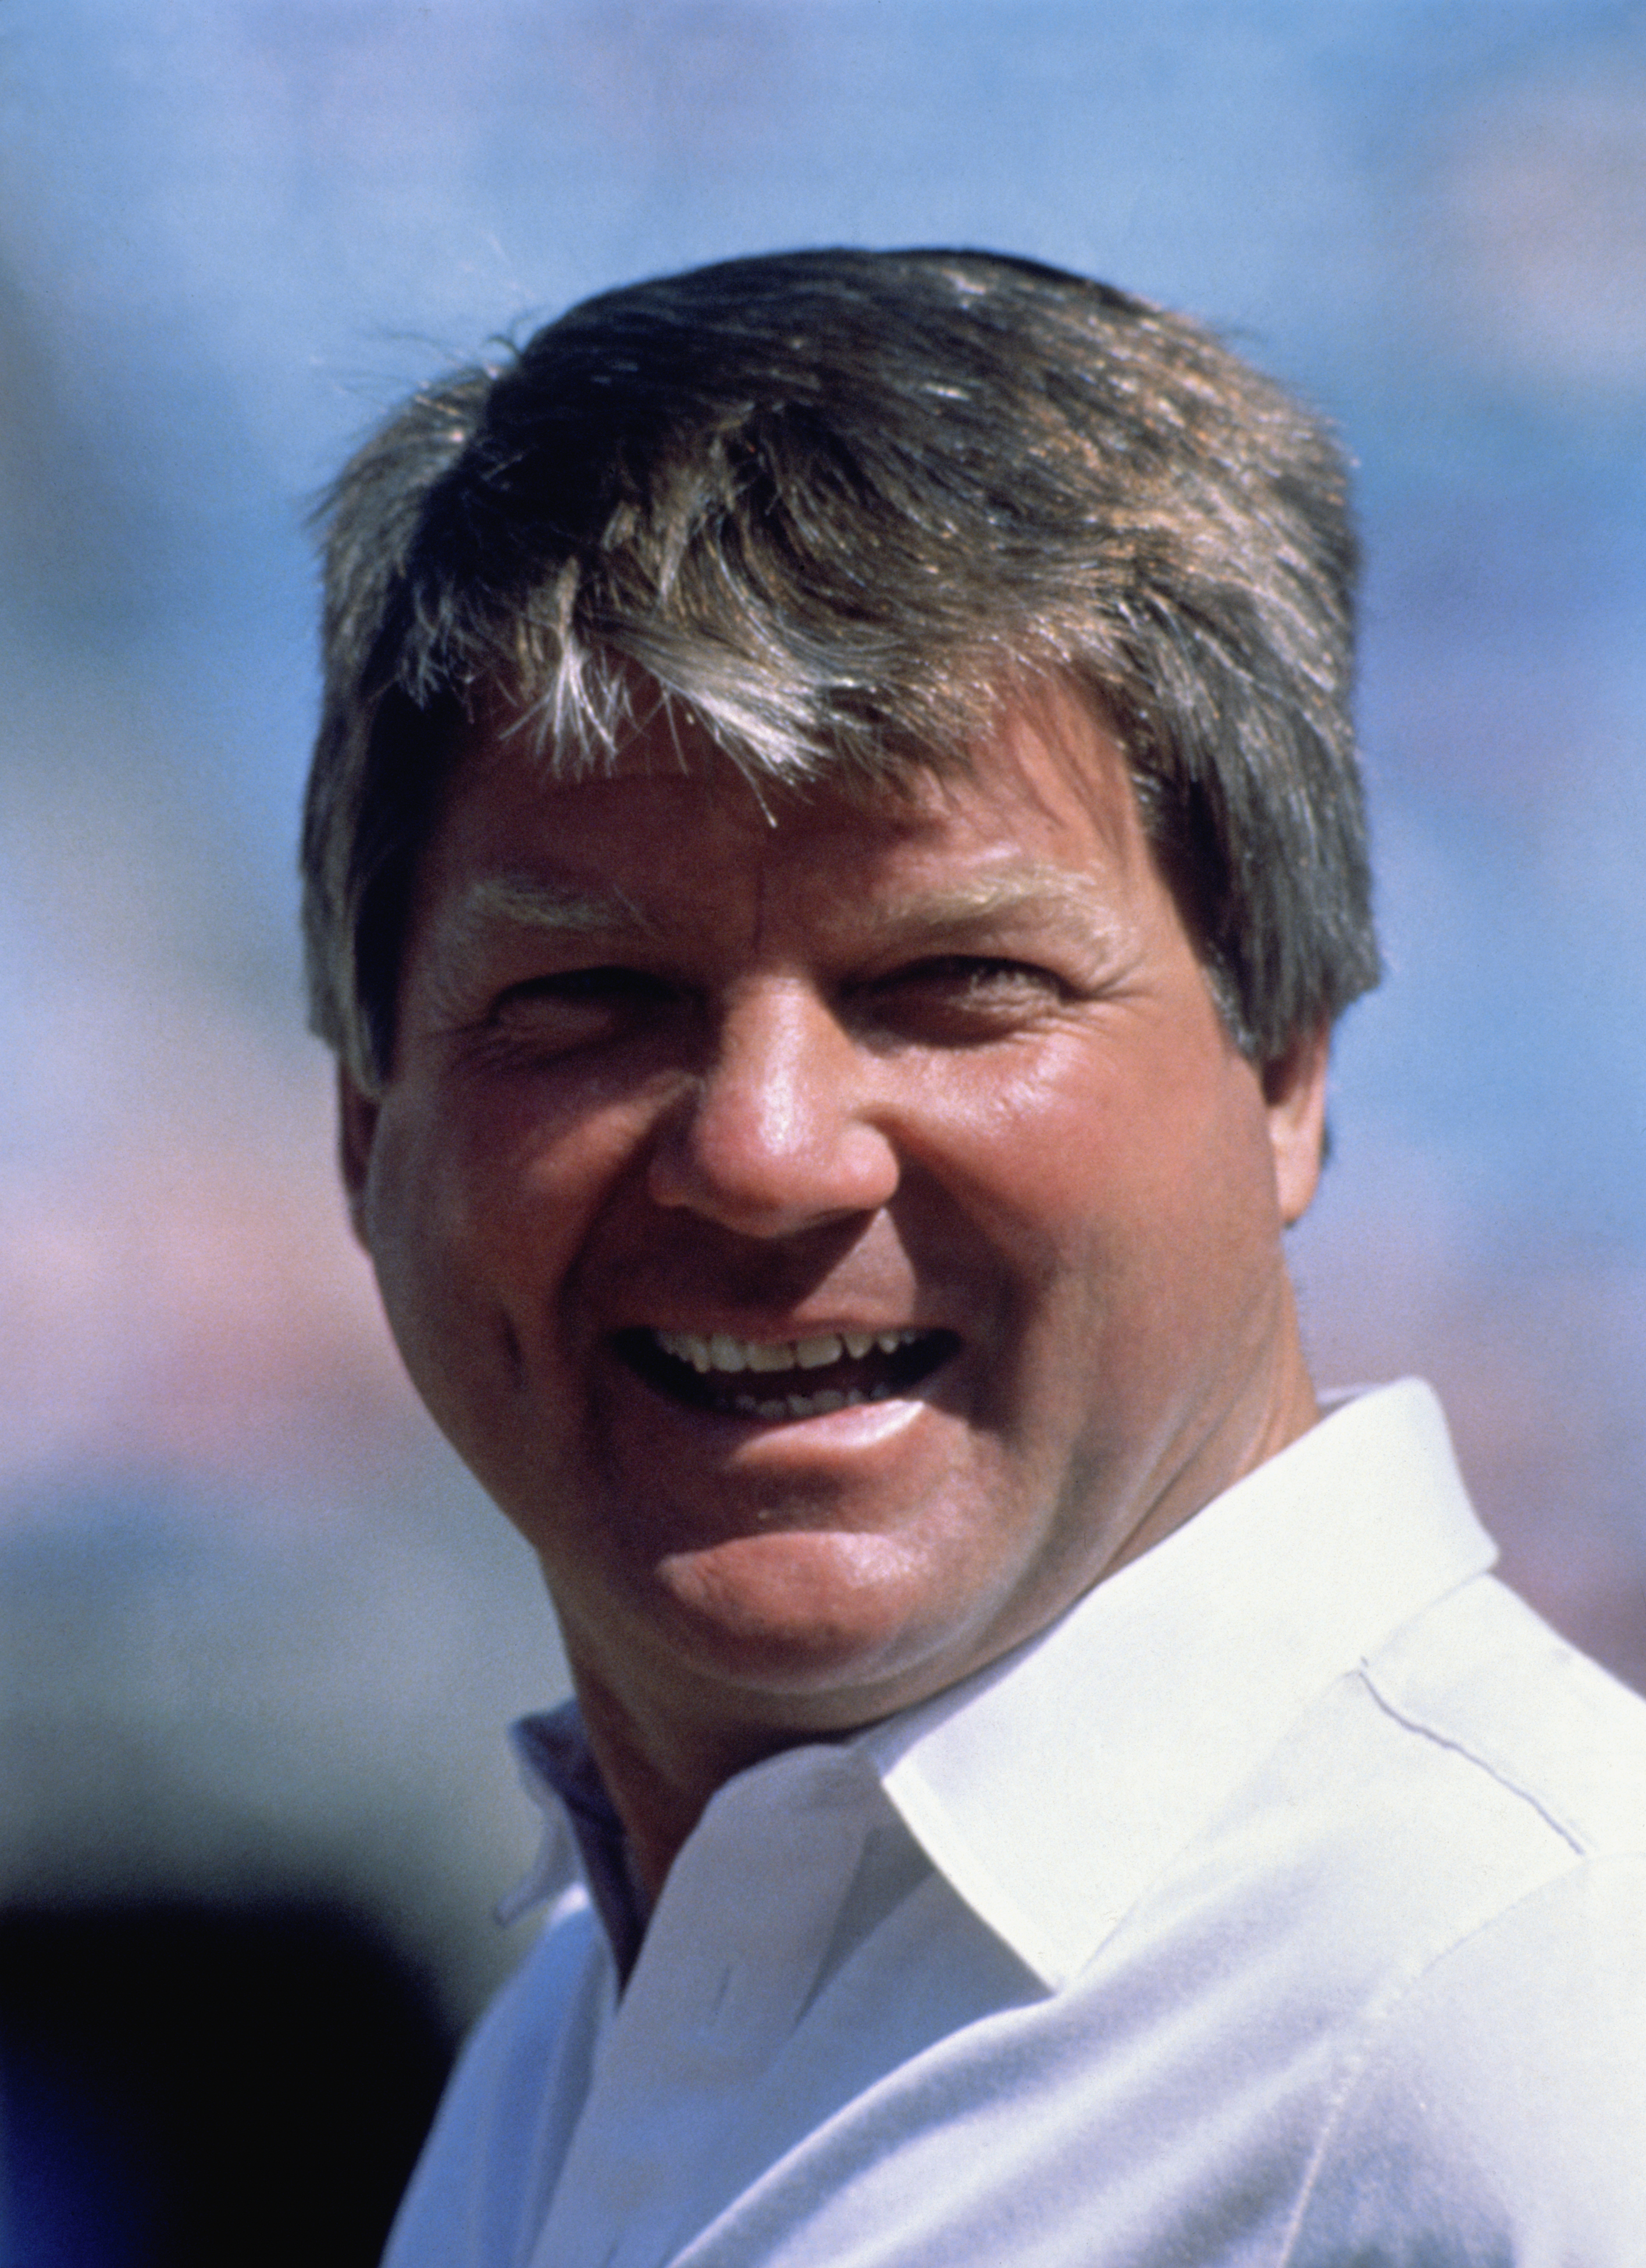 Coach of Dallas Cowboys Jimmy Johnson